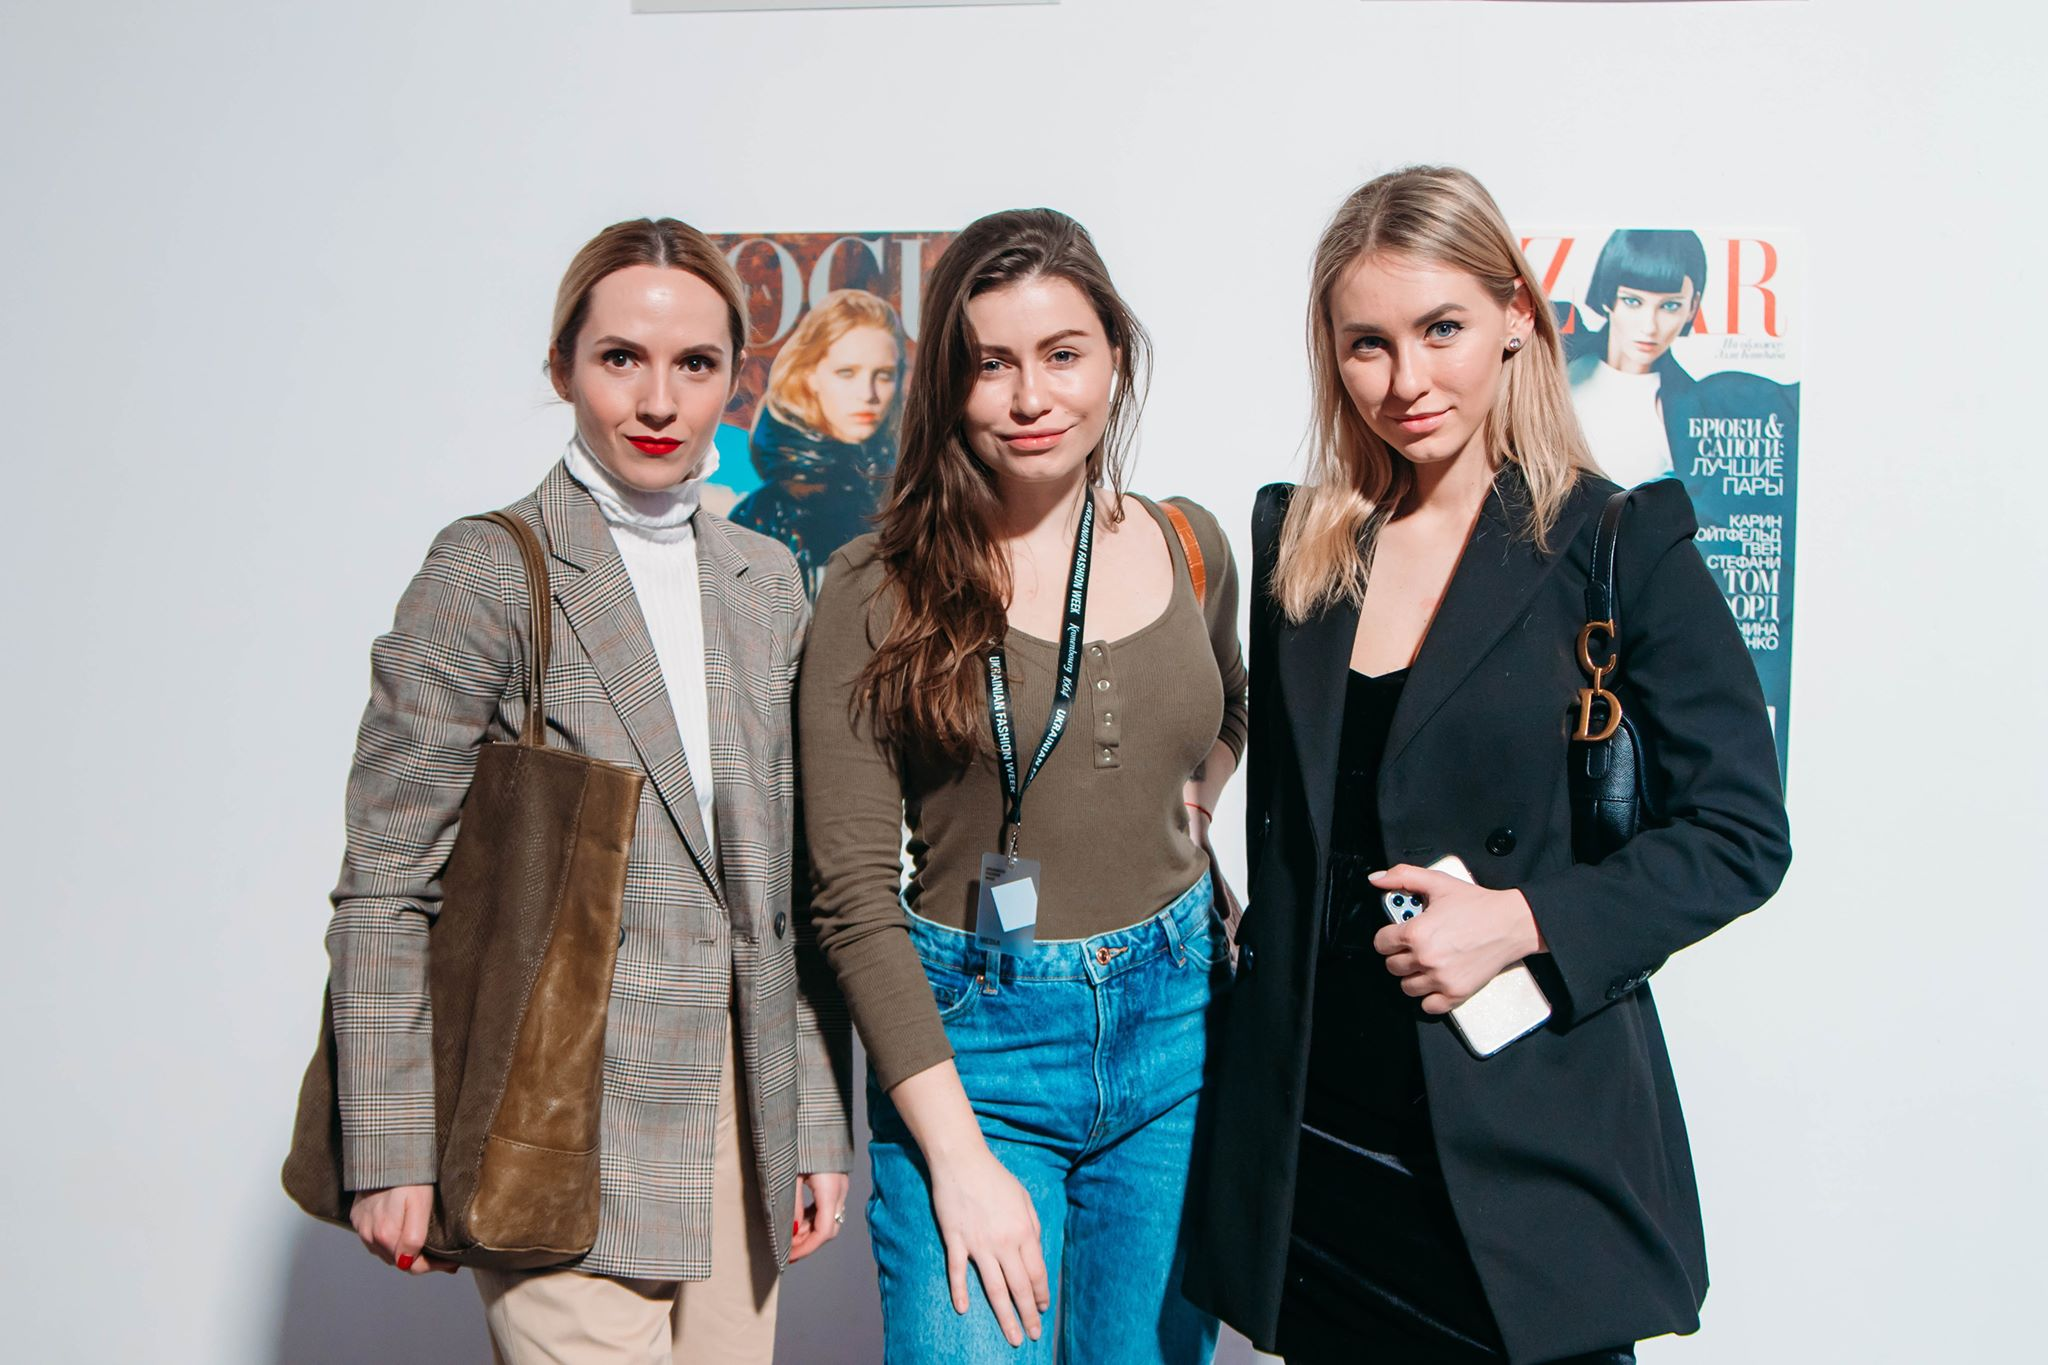 Стилист Анна Константинова, редактор Информатор Киев Алина Харавасил и блоггер Мила Заболотная на UFW